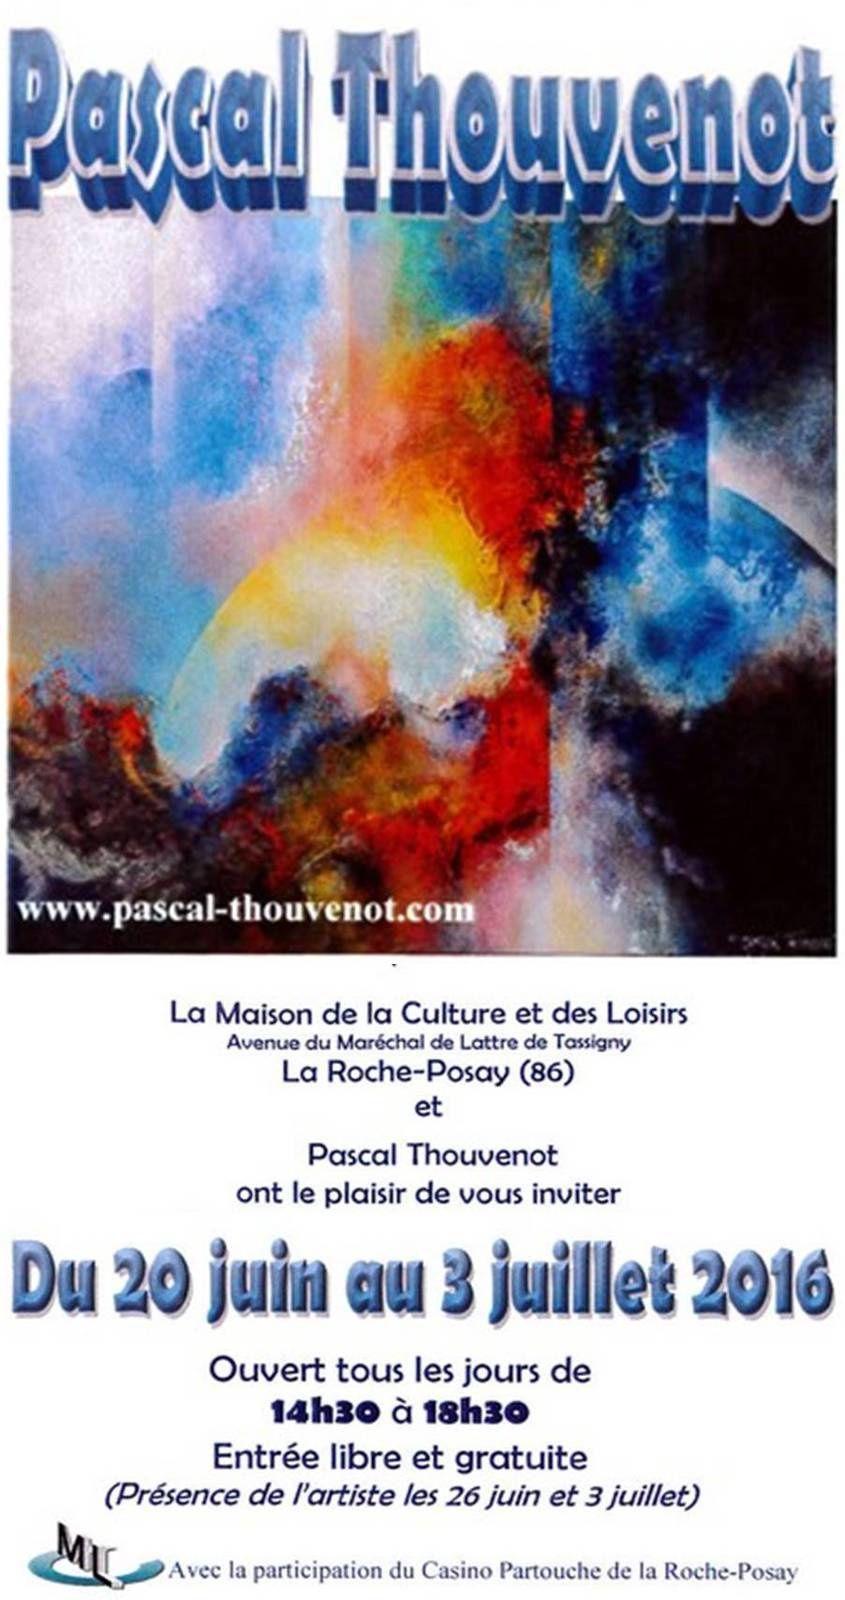 20 JUIN - 3 JUILLET 2016 : PASCAL THOUVENOT EXPOSE A LA ROCHE-POSAY